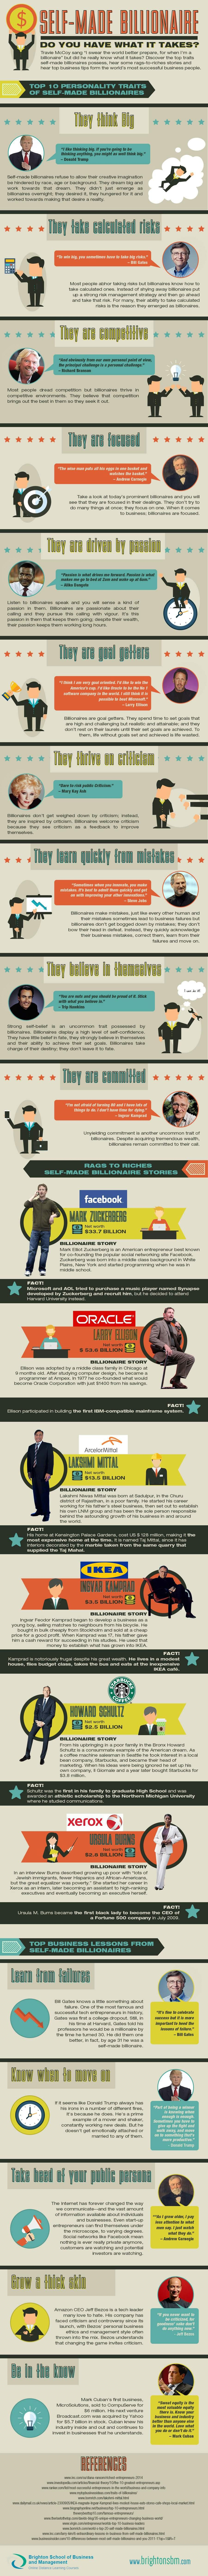 Self-Made Billionaires [Infographic]